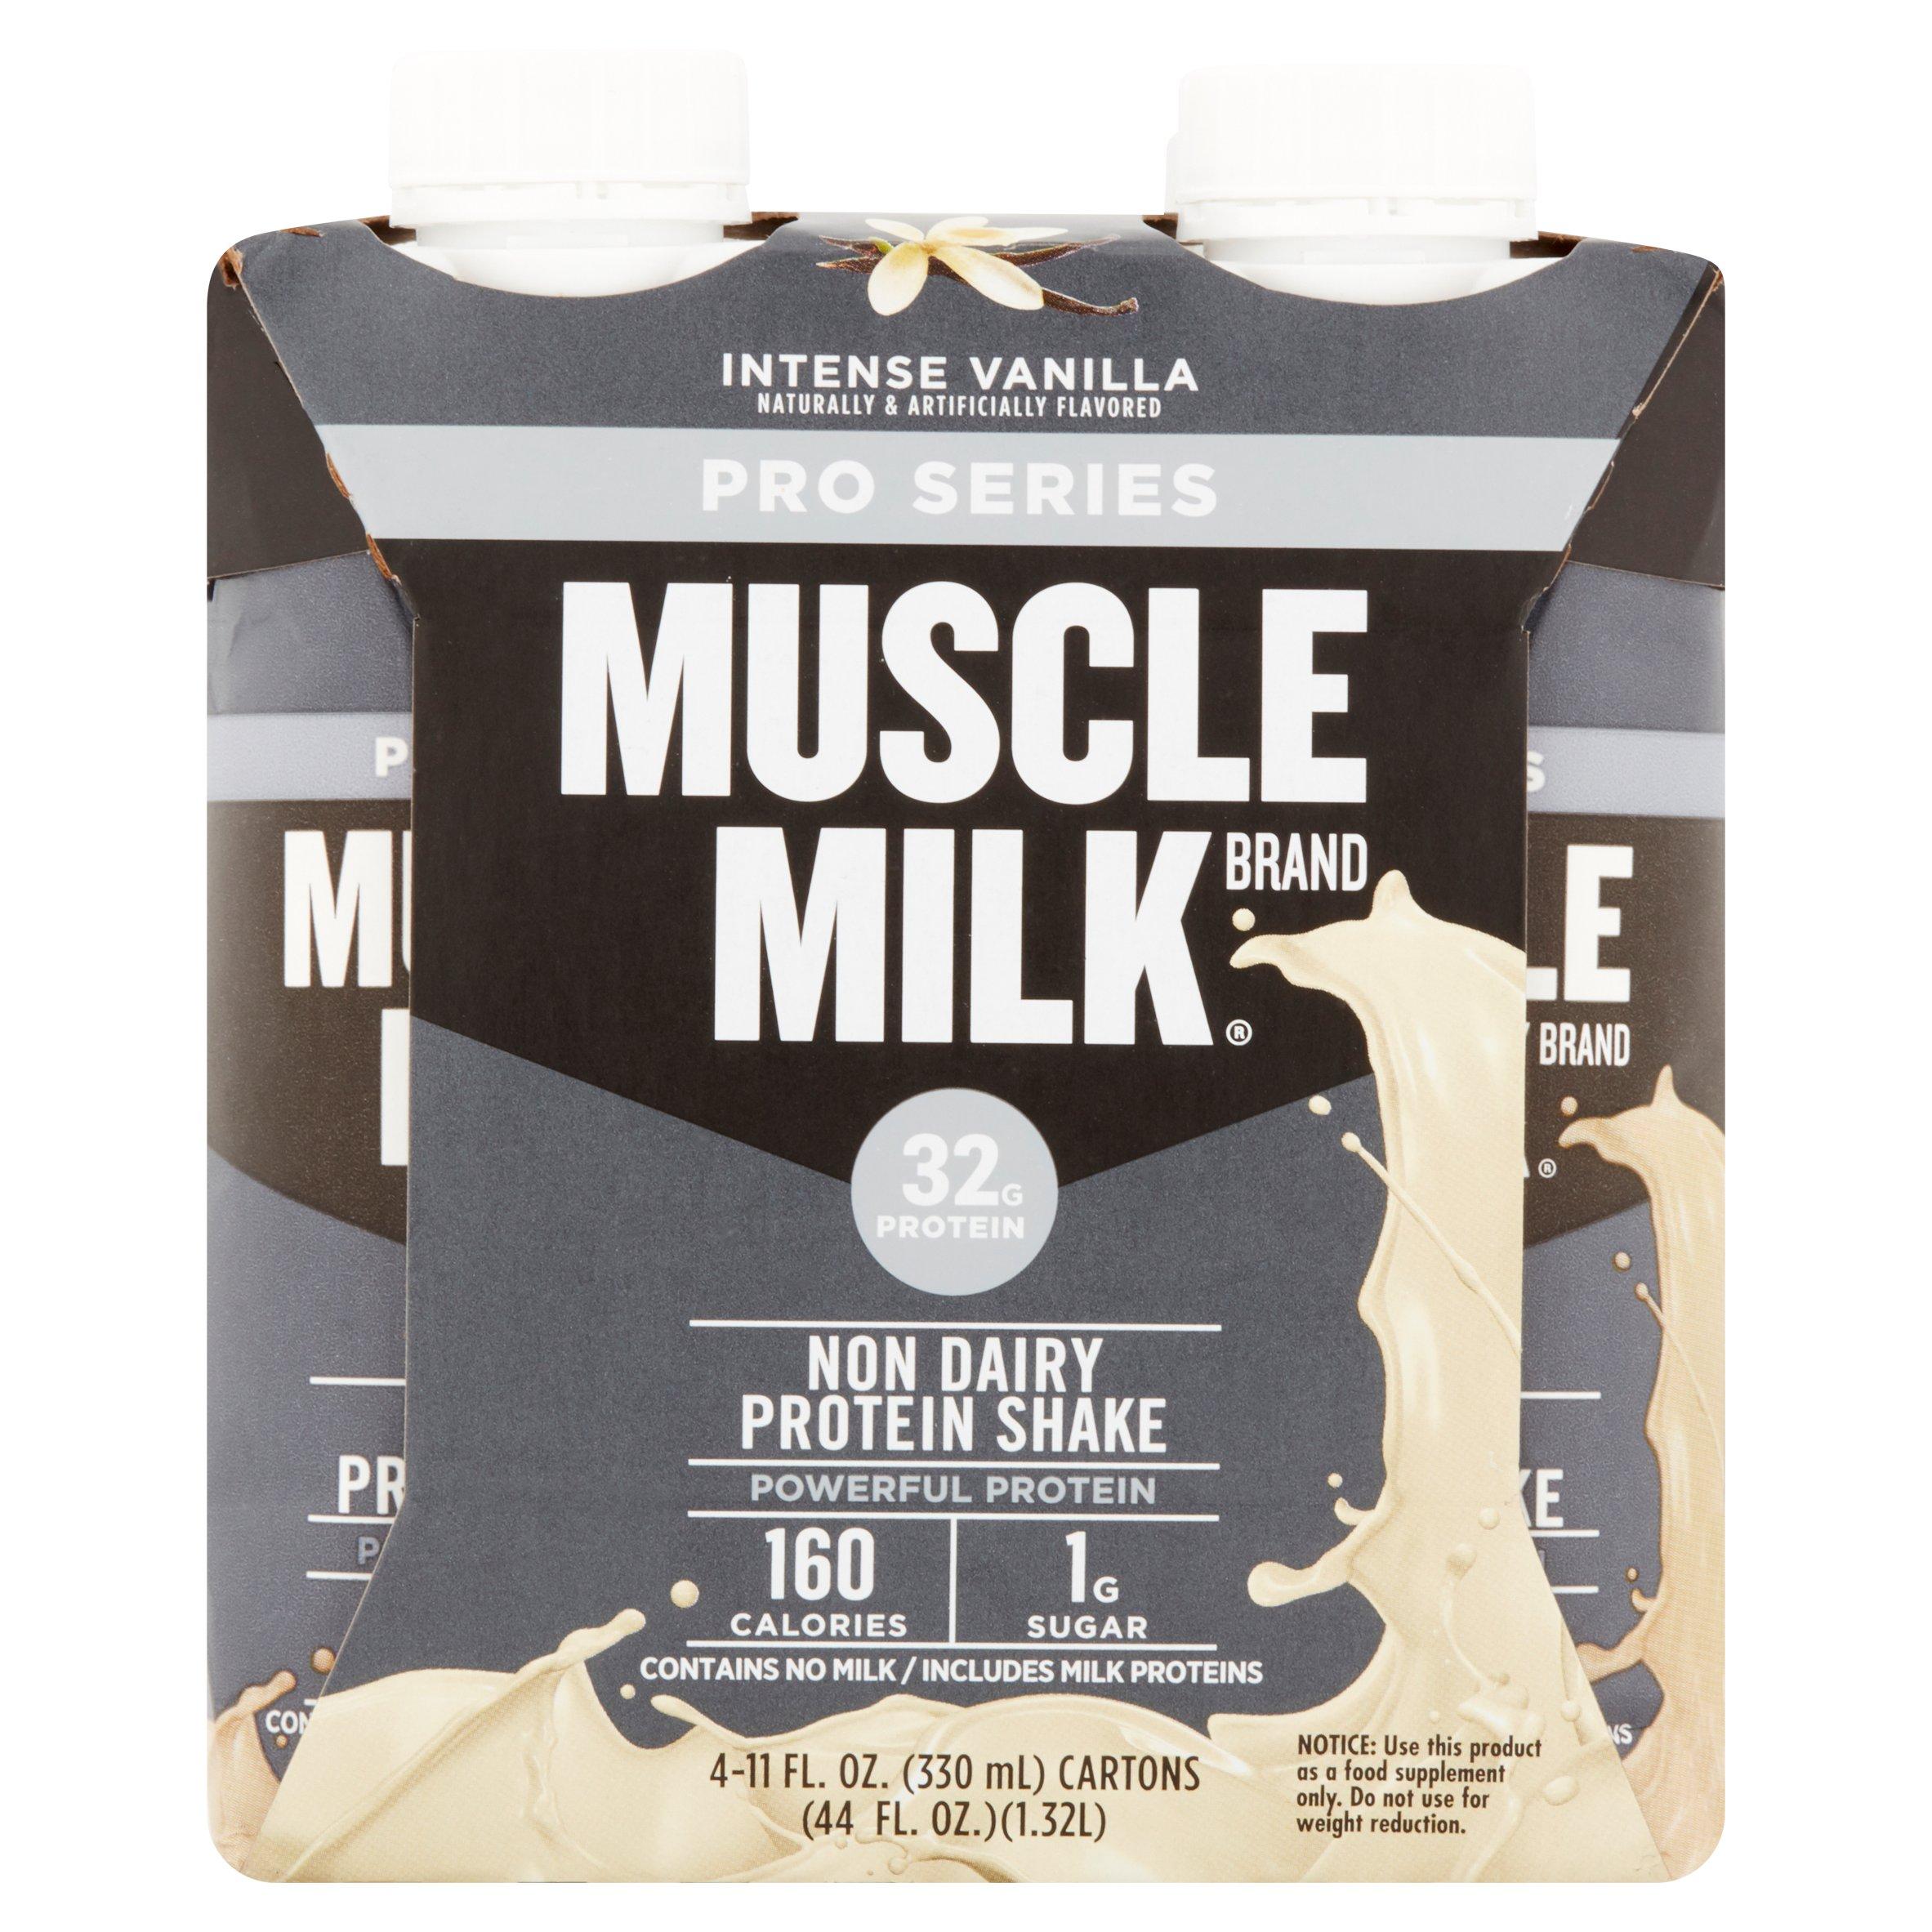 Muscle Milk Pro Series Shake, 32 Grams of Protein, Intense Vanilla, 11 Oz, 4 Ct